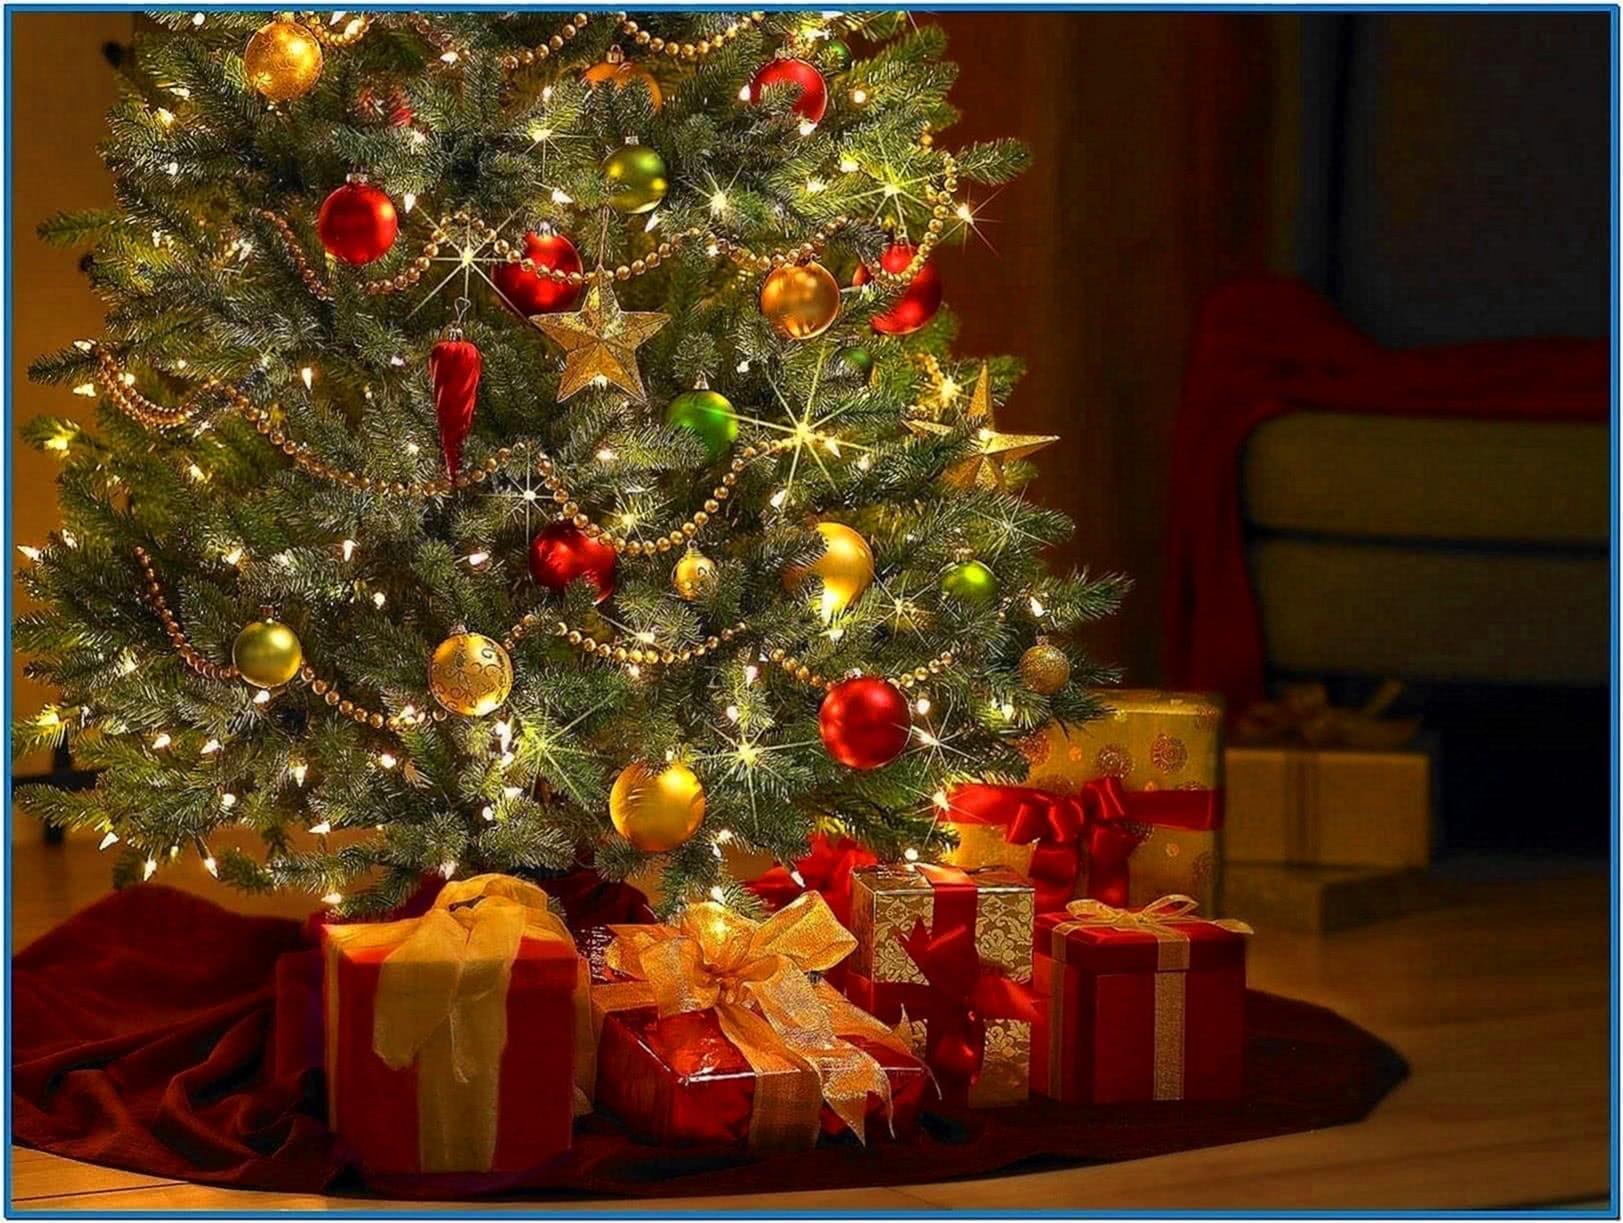 Christmas Screensaver for Computer